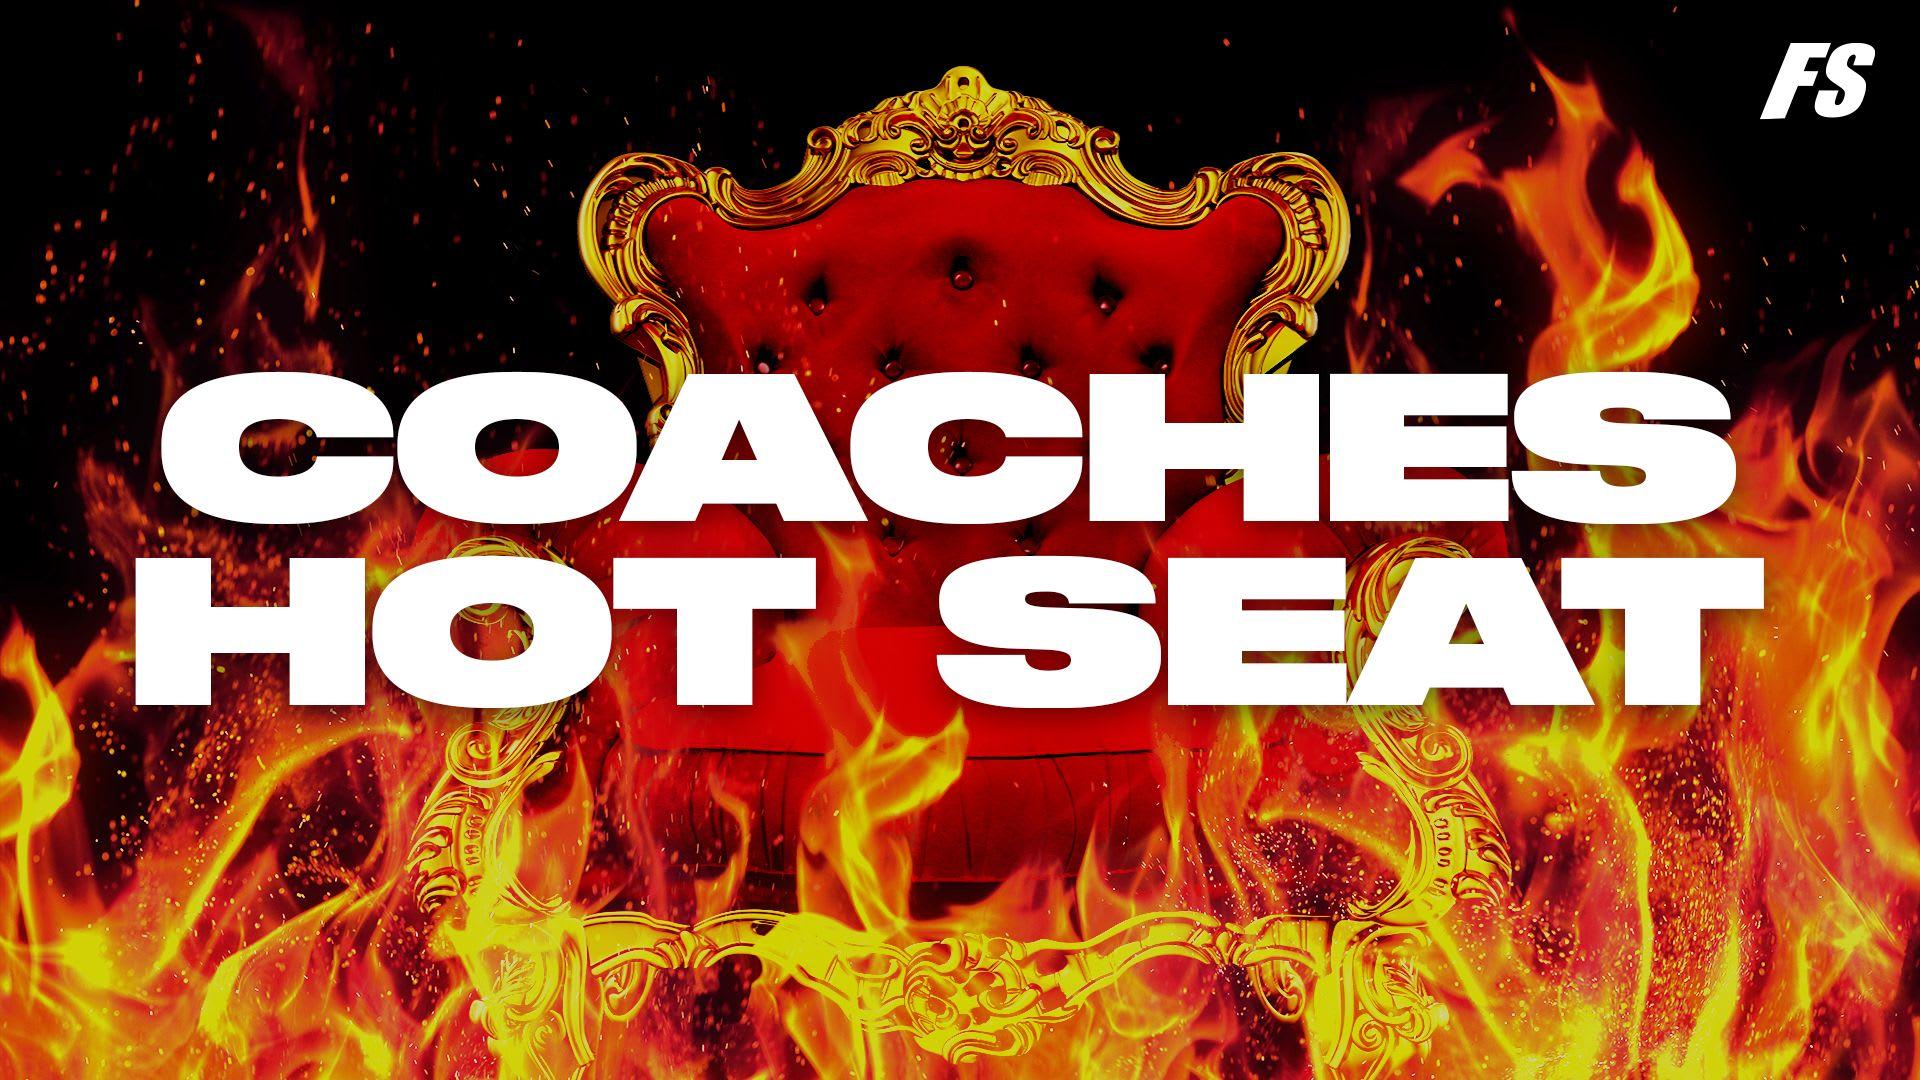 Coaches hot seat